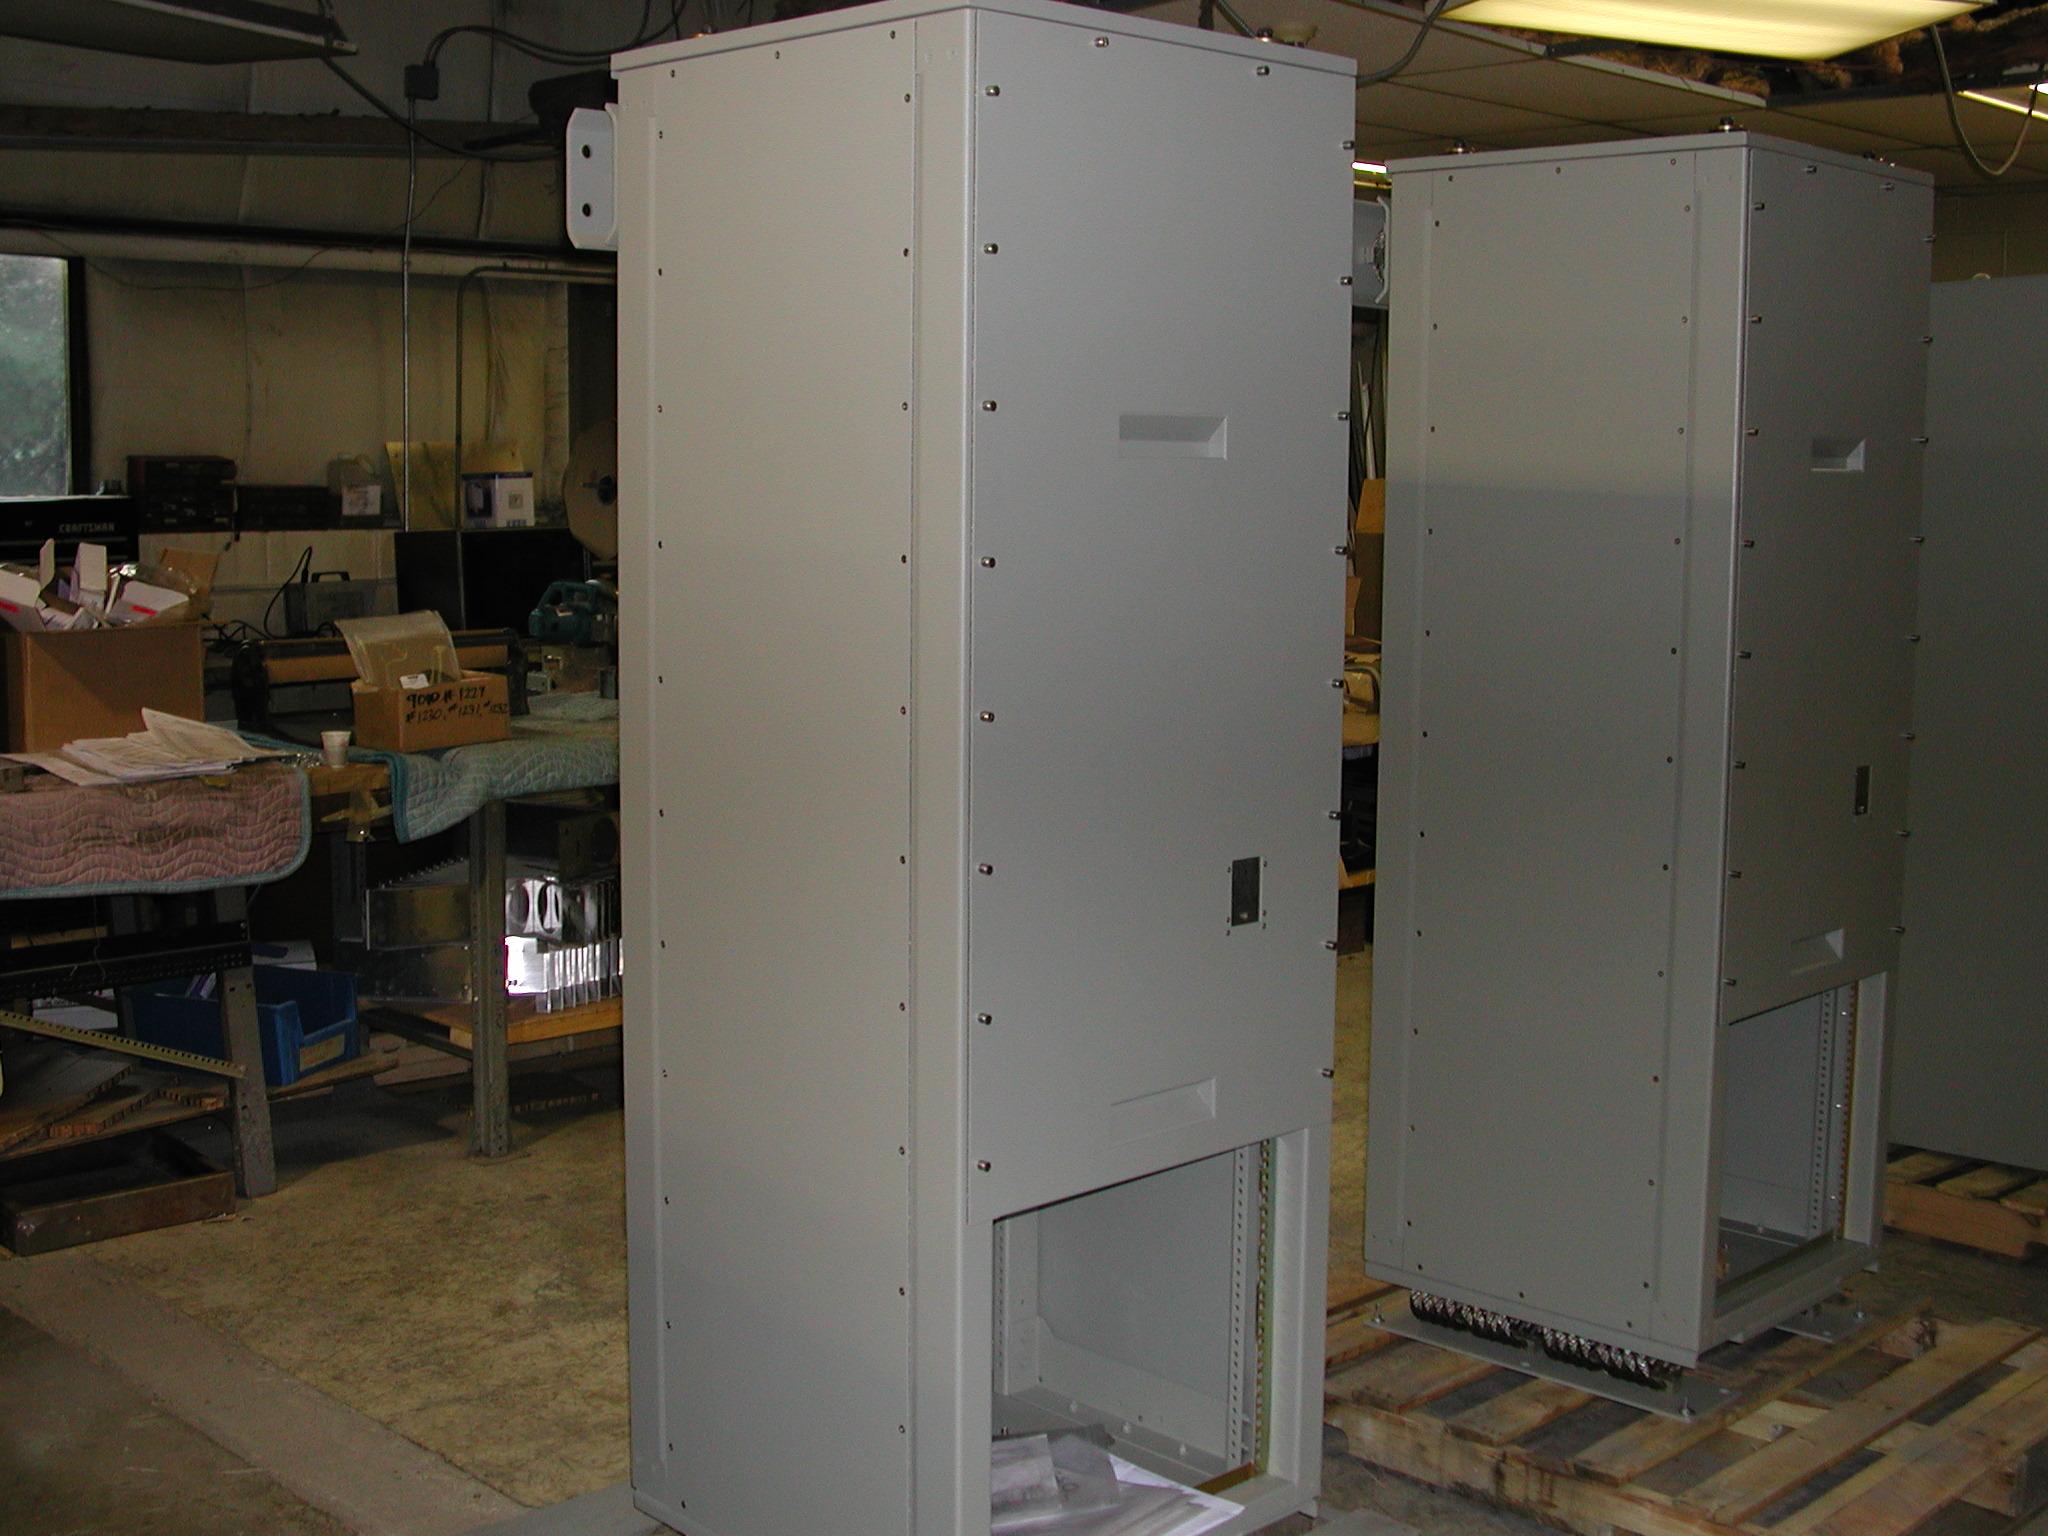 Metal Enclosures Millitary Hopewell Precision NY DSCN1689.JPG